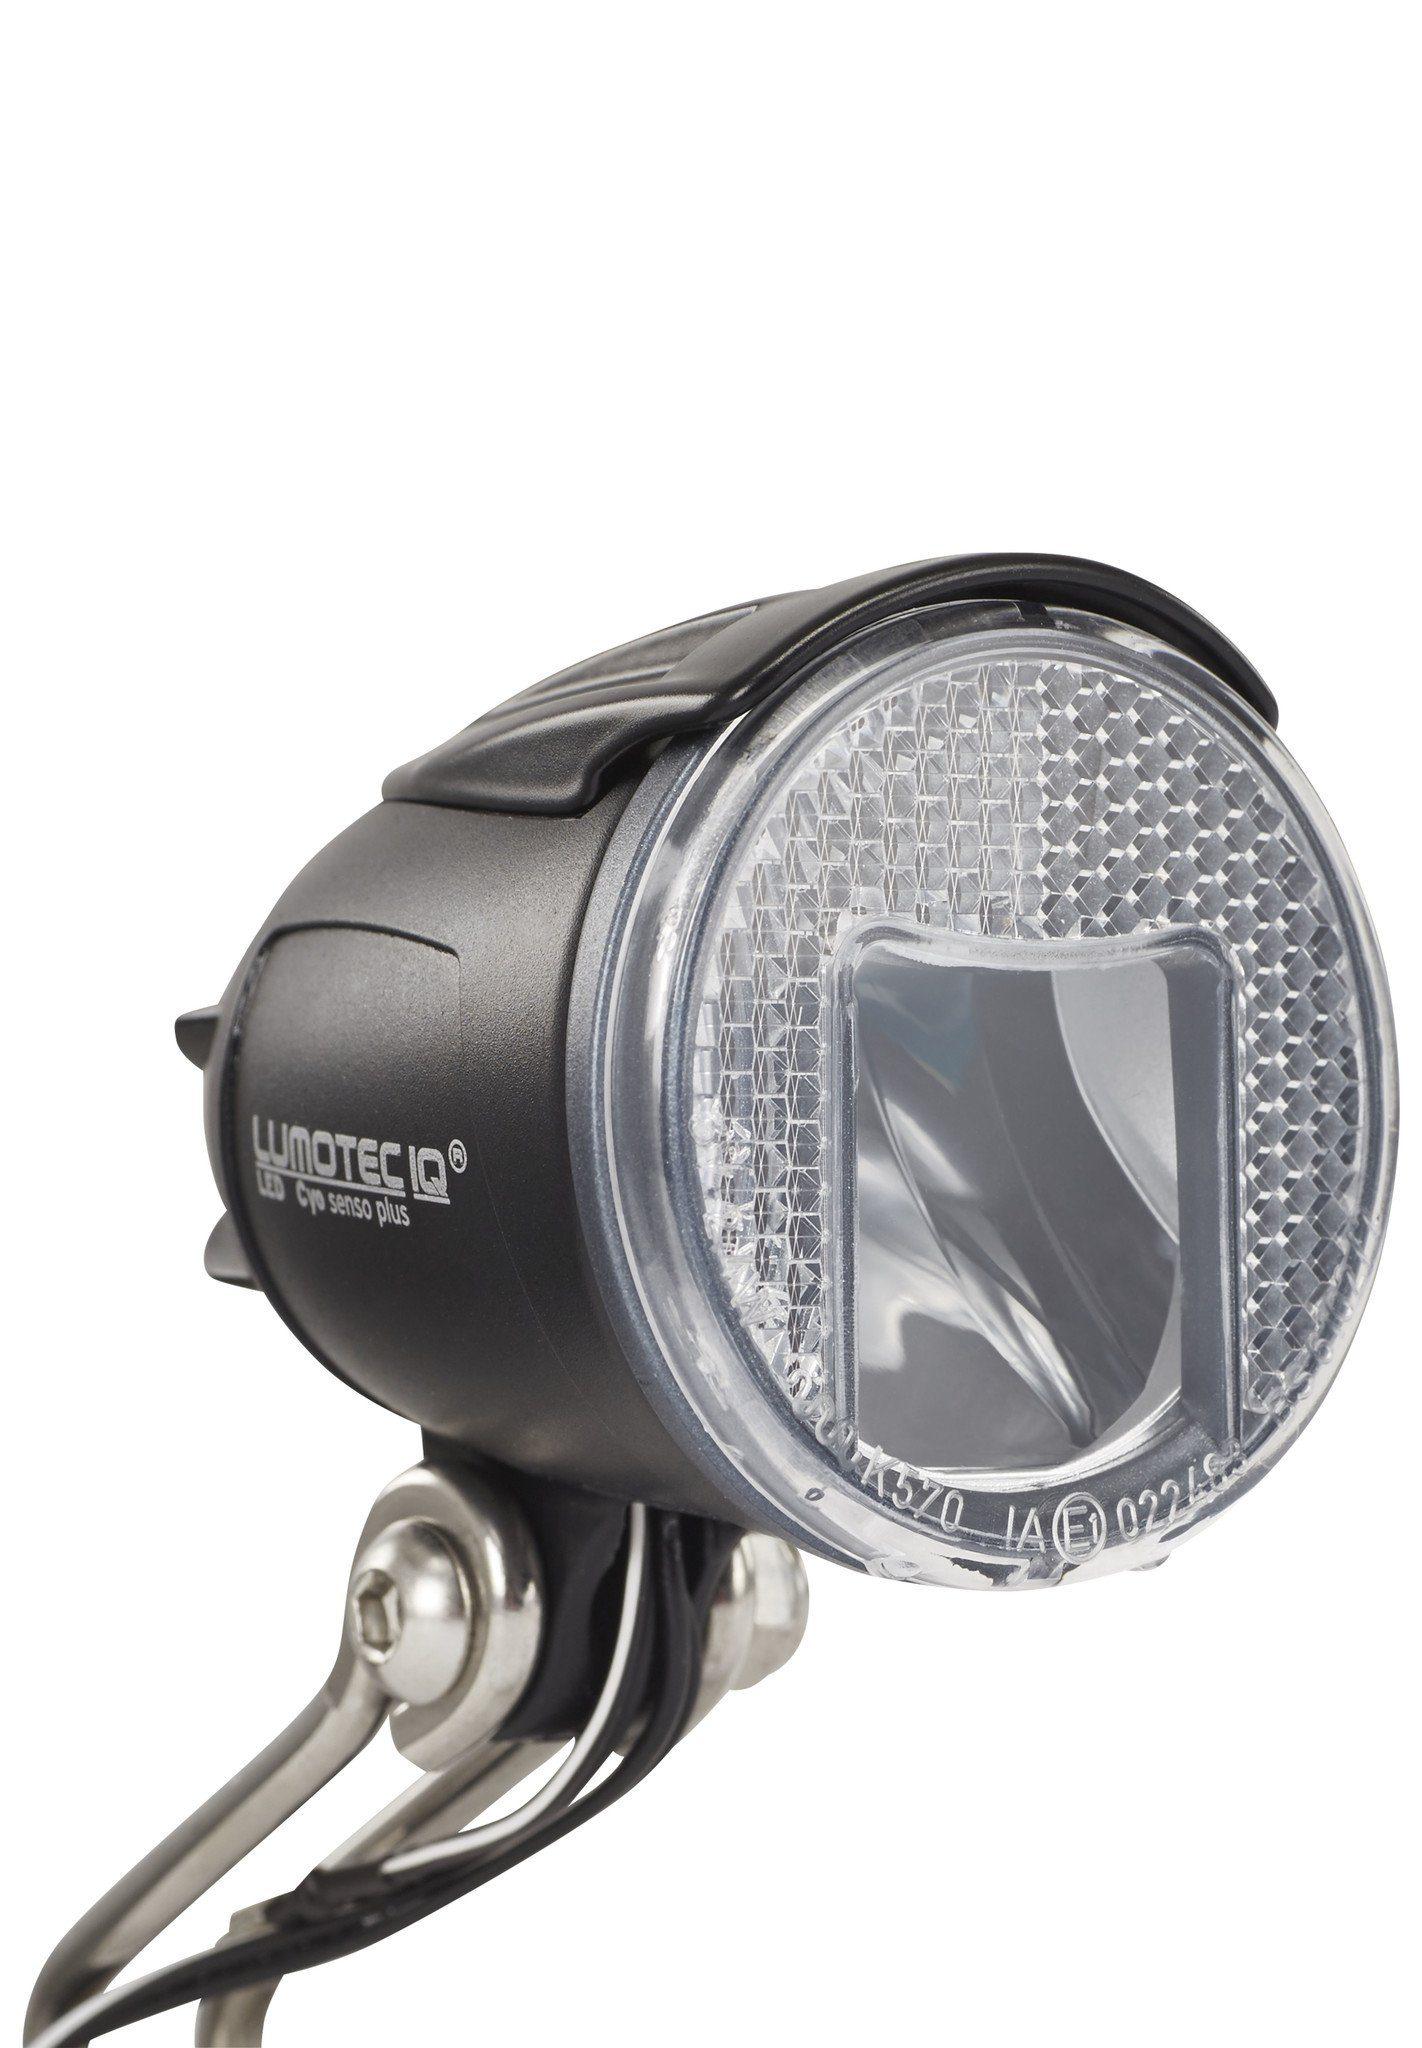 Busch + Müller Fahrradbeleuchtung »Lumotec IQ Cyo R senso plus LED-Scheinwerfer«